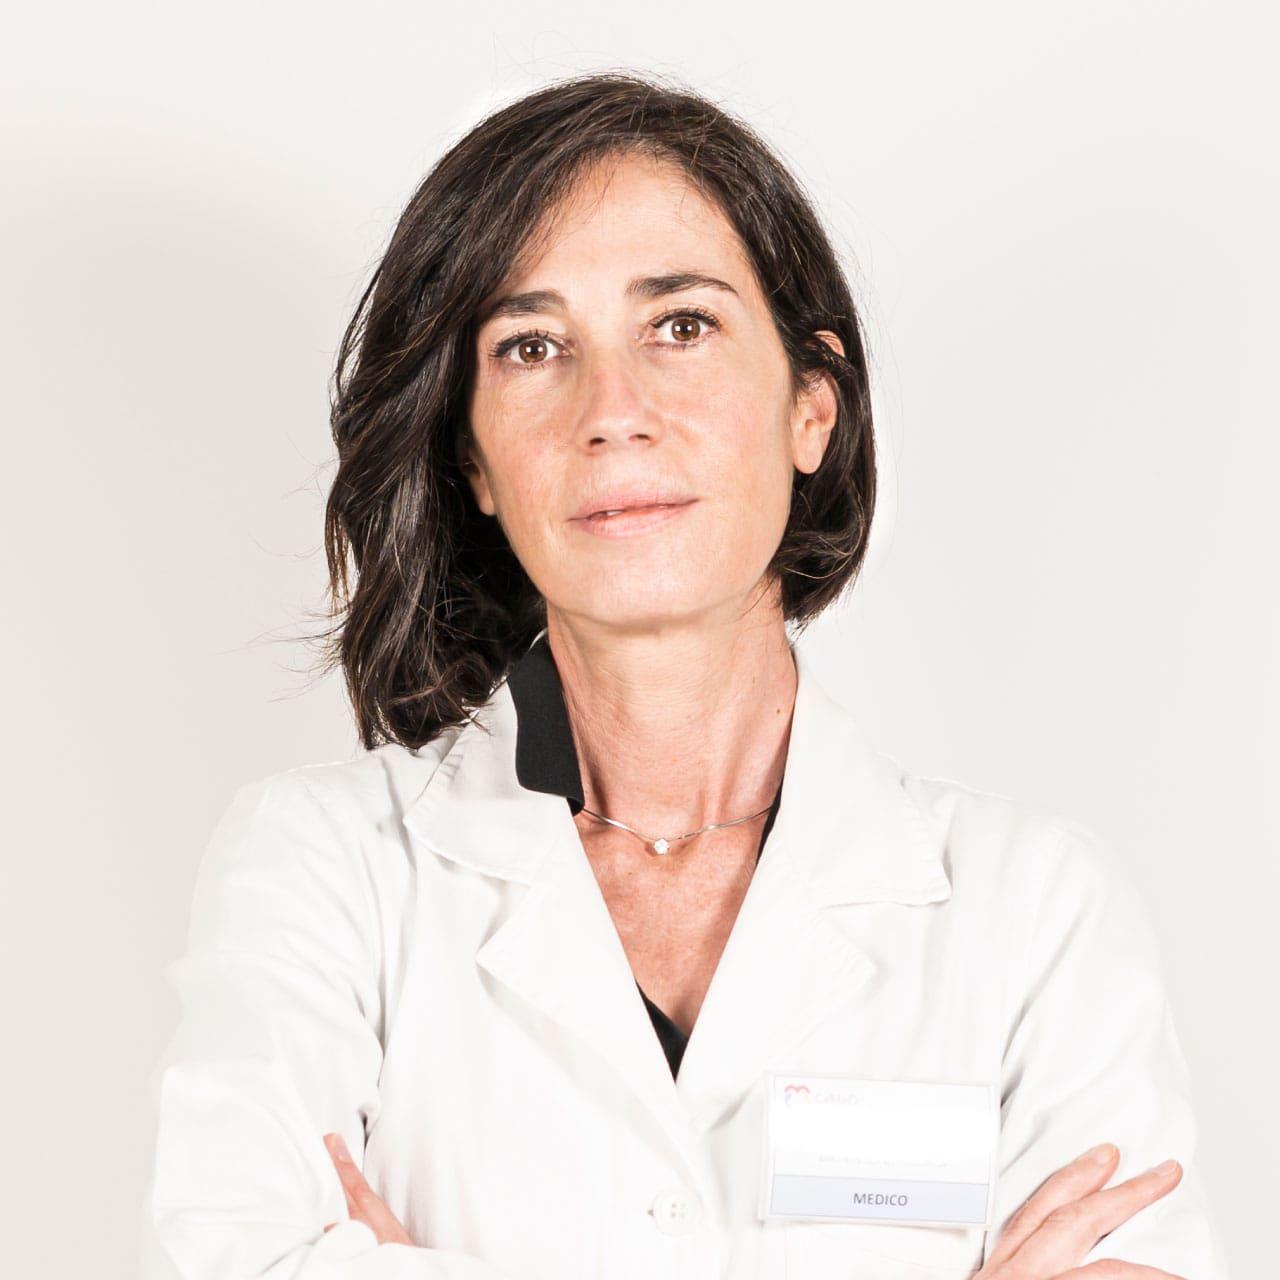 Rubino Dott.ssa Alessandra